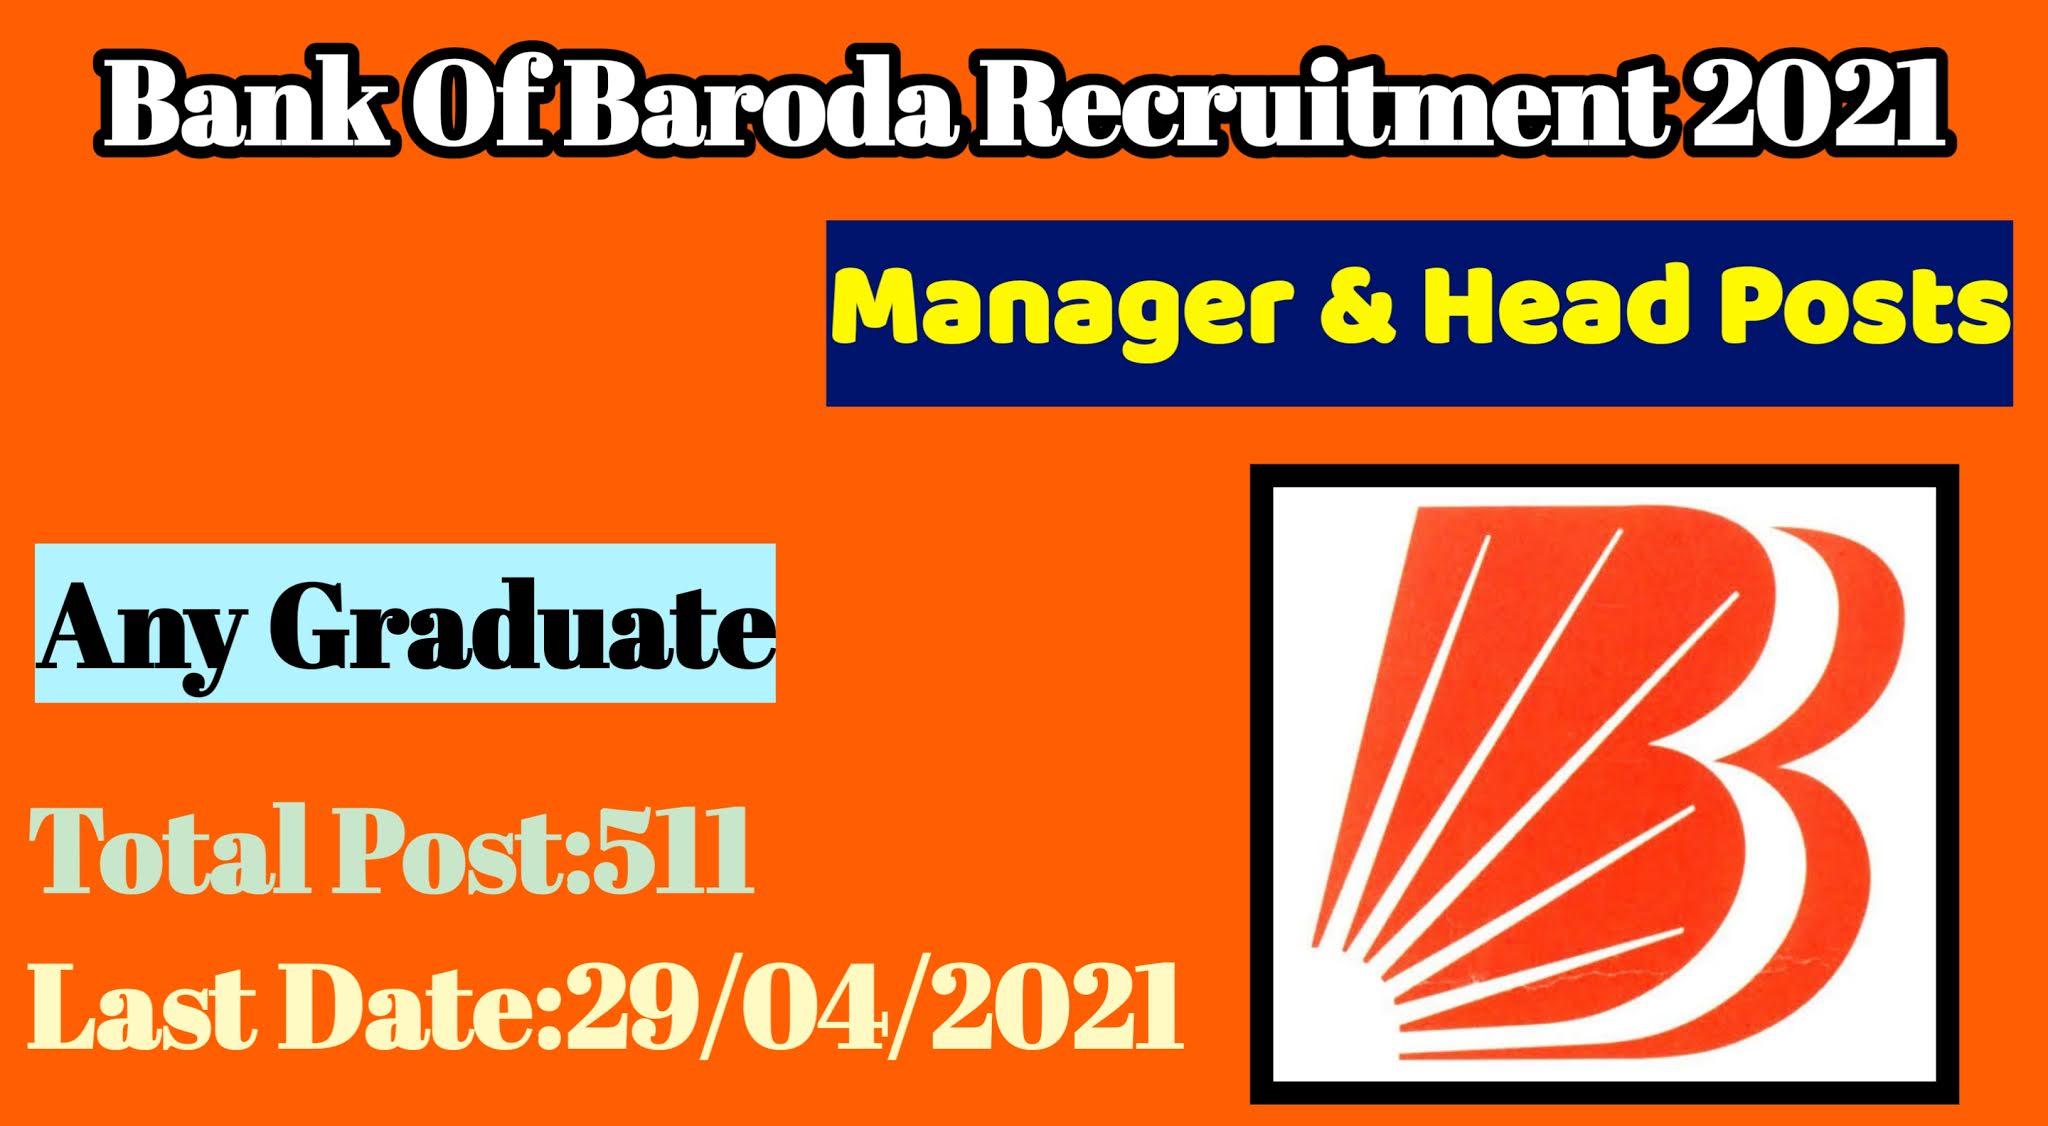 Bank of baroda recruitment 2021,bob recruitment 2021,bank of baroda recruitment apply online,bob vacancy 2021,bob jobs,bank of baroda recruitment pdf